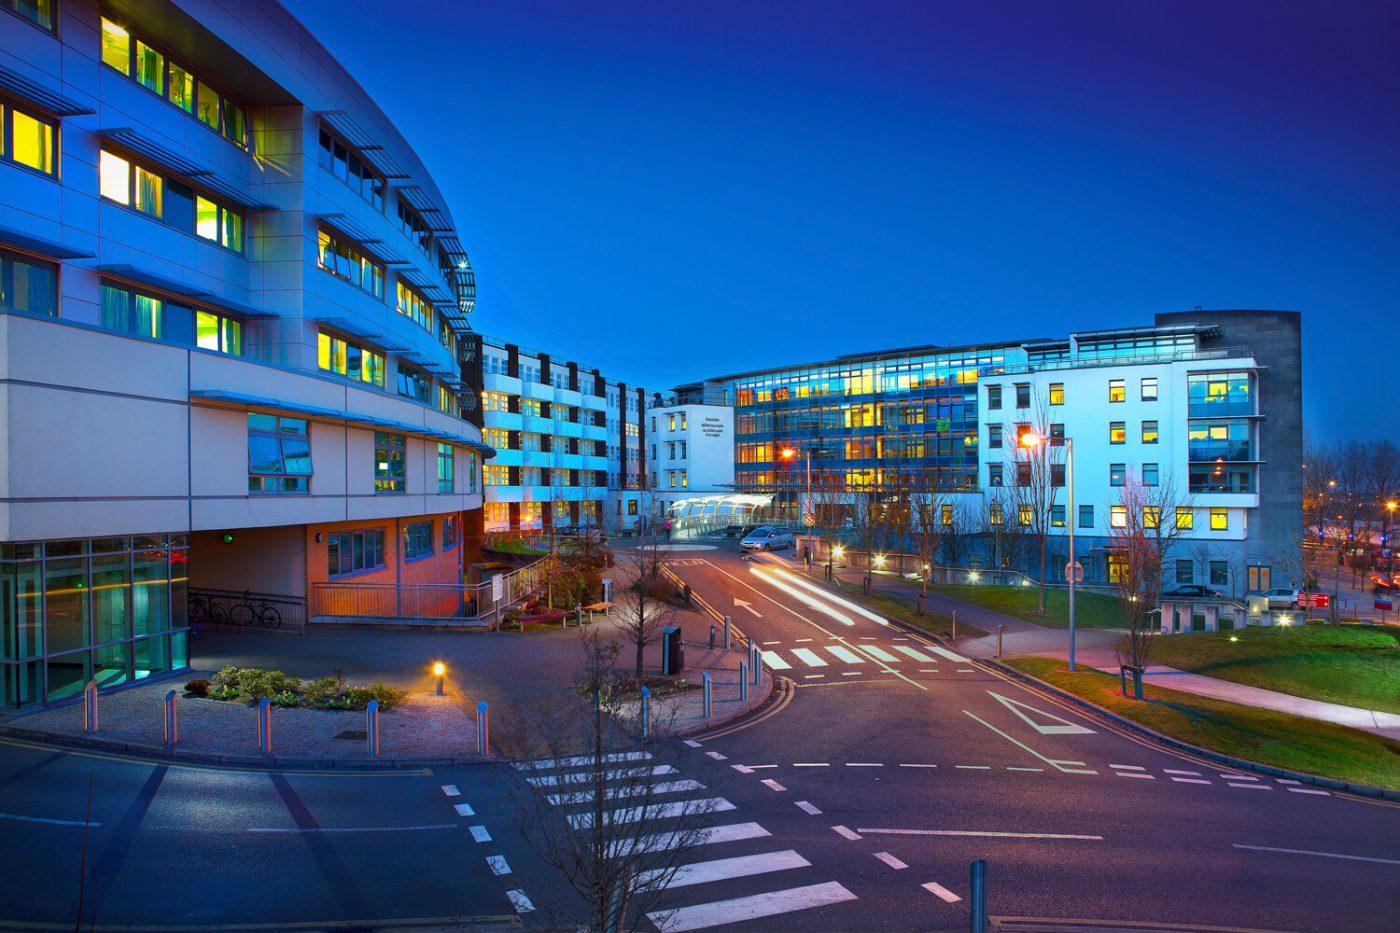 Jim McCarthy Photographer Cork - Photography Prints - Cork University Hospital